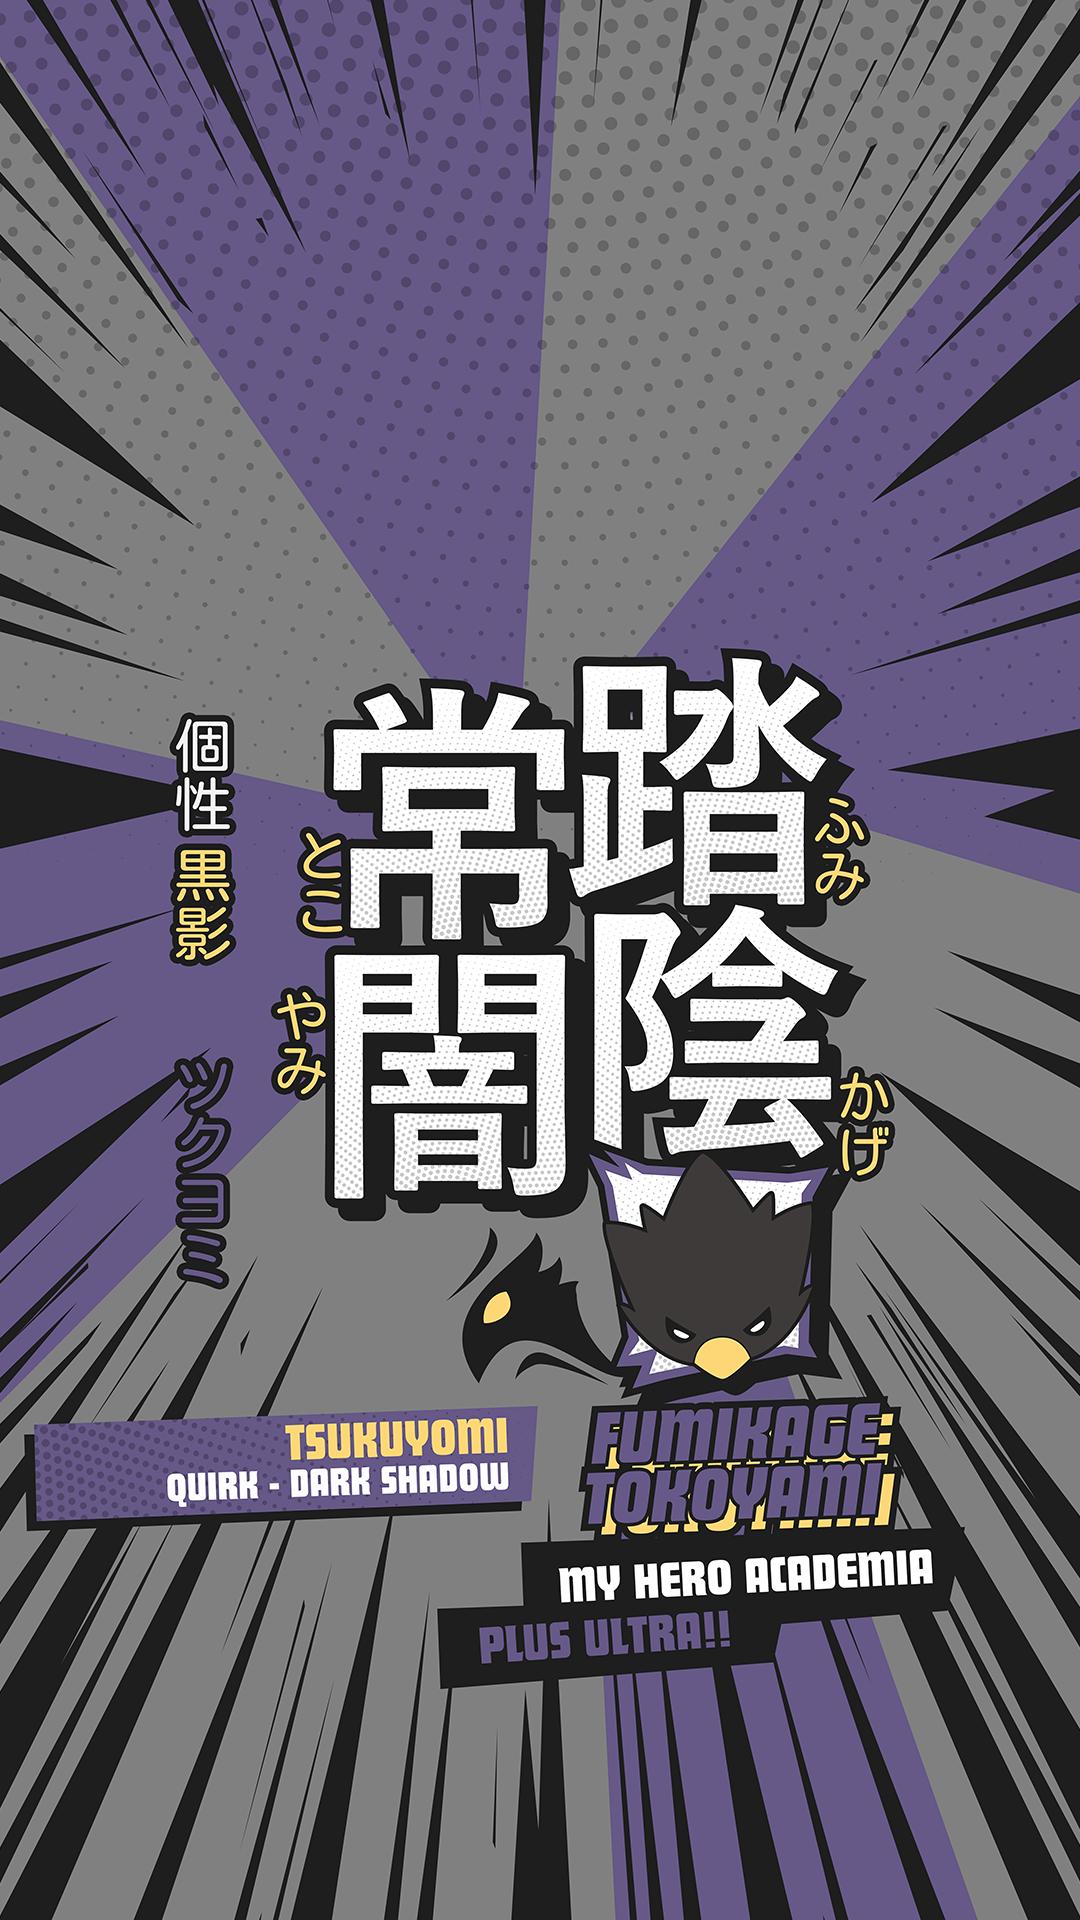 Tsukuyomi Wallpaper - Fumikage Tokoyami Wallpaper - My Hero Academia